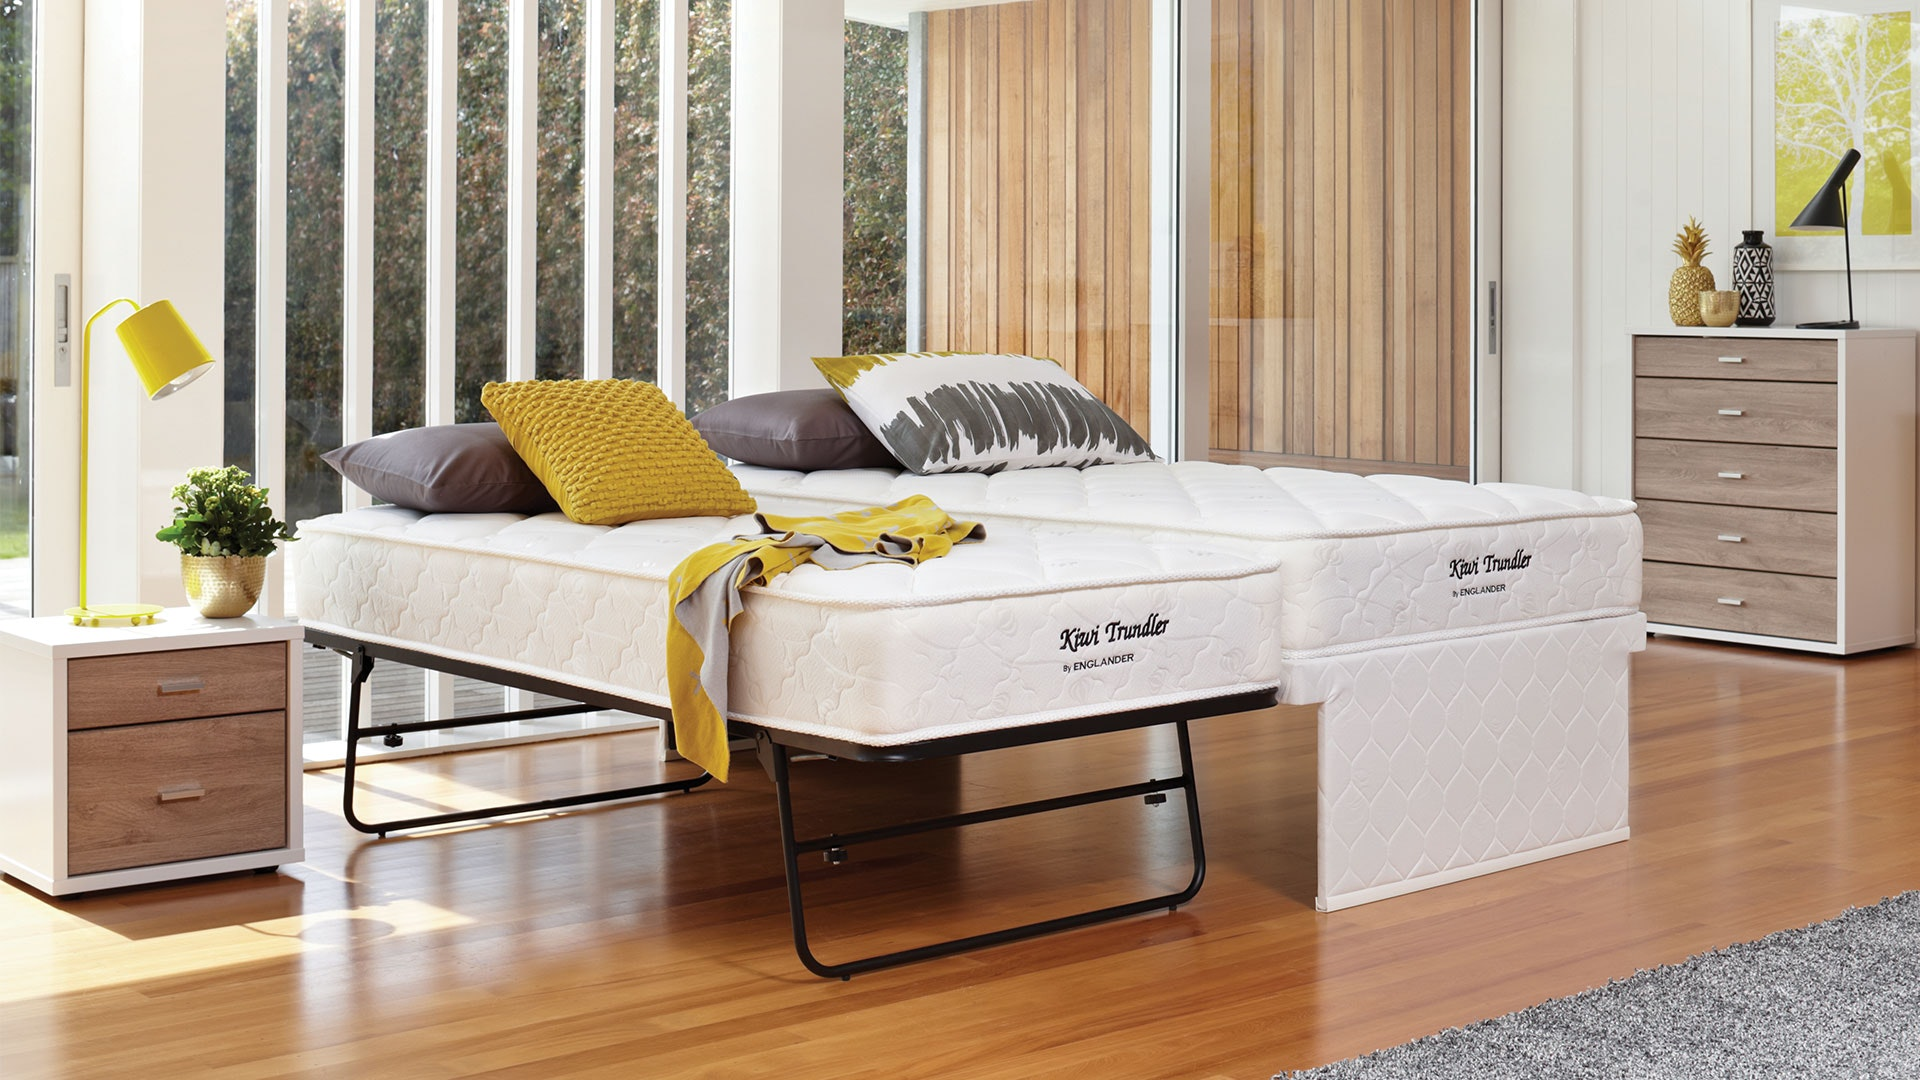 Kiwi King Single Trundle Bed By Englander Harvey Norman New Zealand